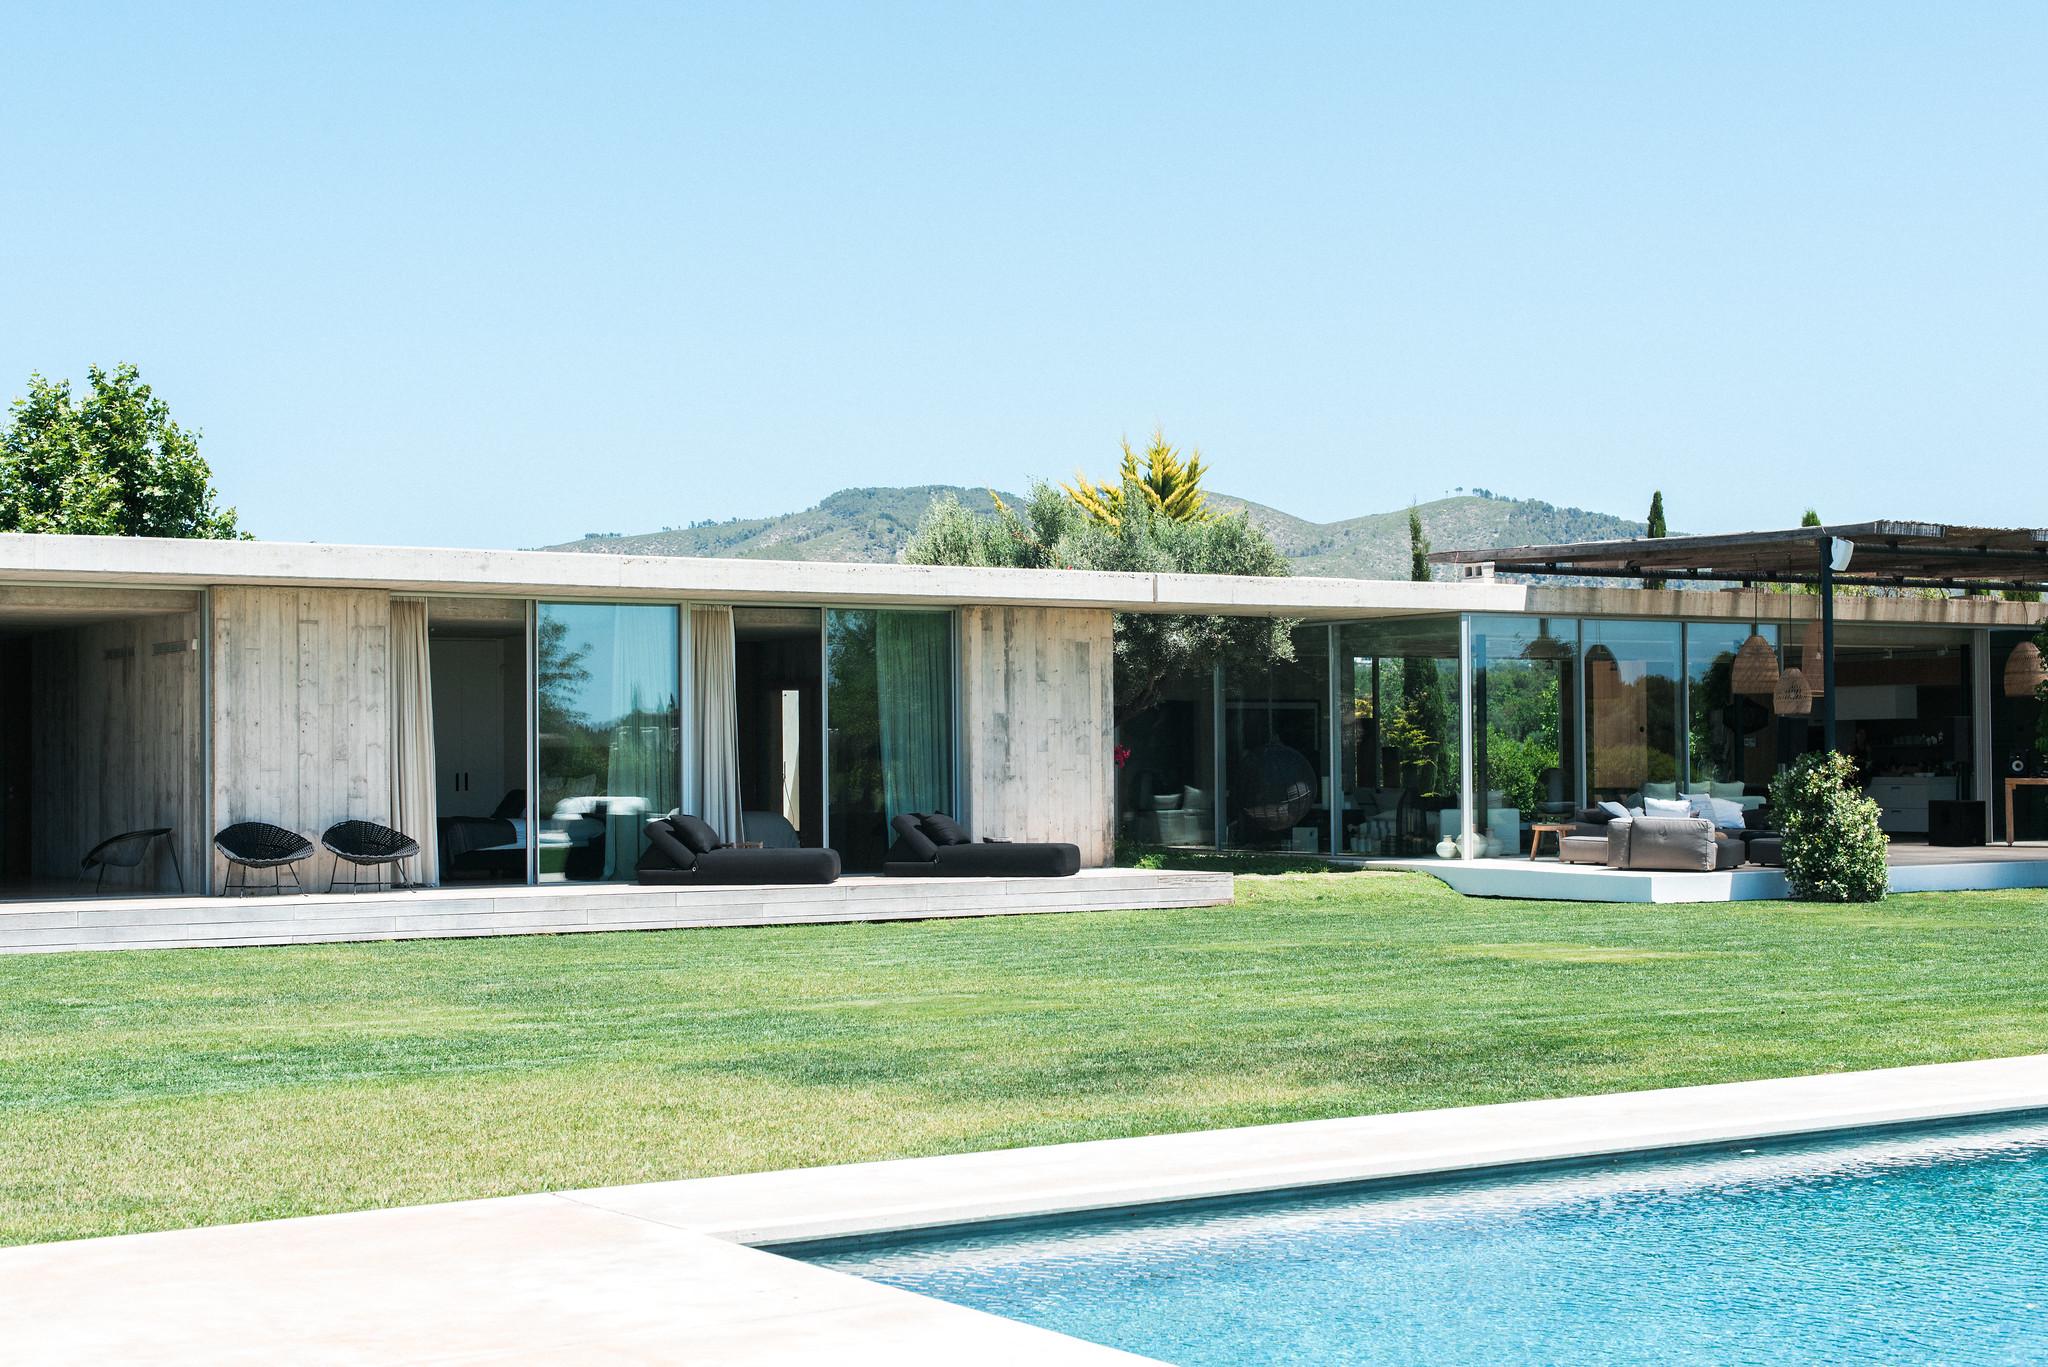 https://www.white-ibiza.com/wp-content/uploads/2020/02/white-ibiza-villas-casa-valentina-exterior-view4.jpg